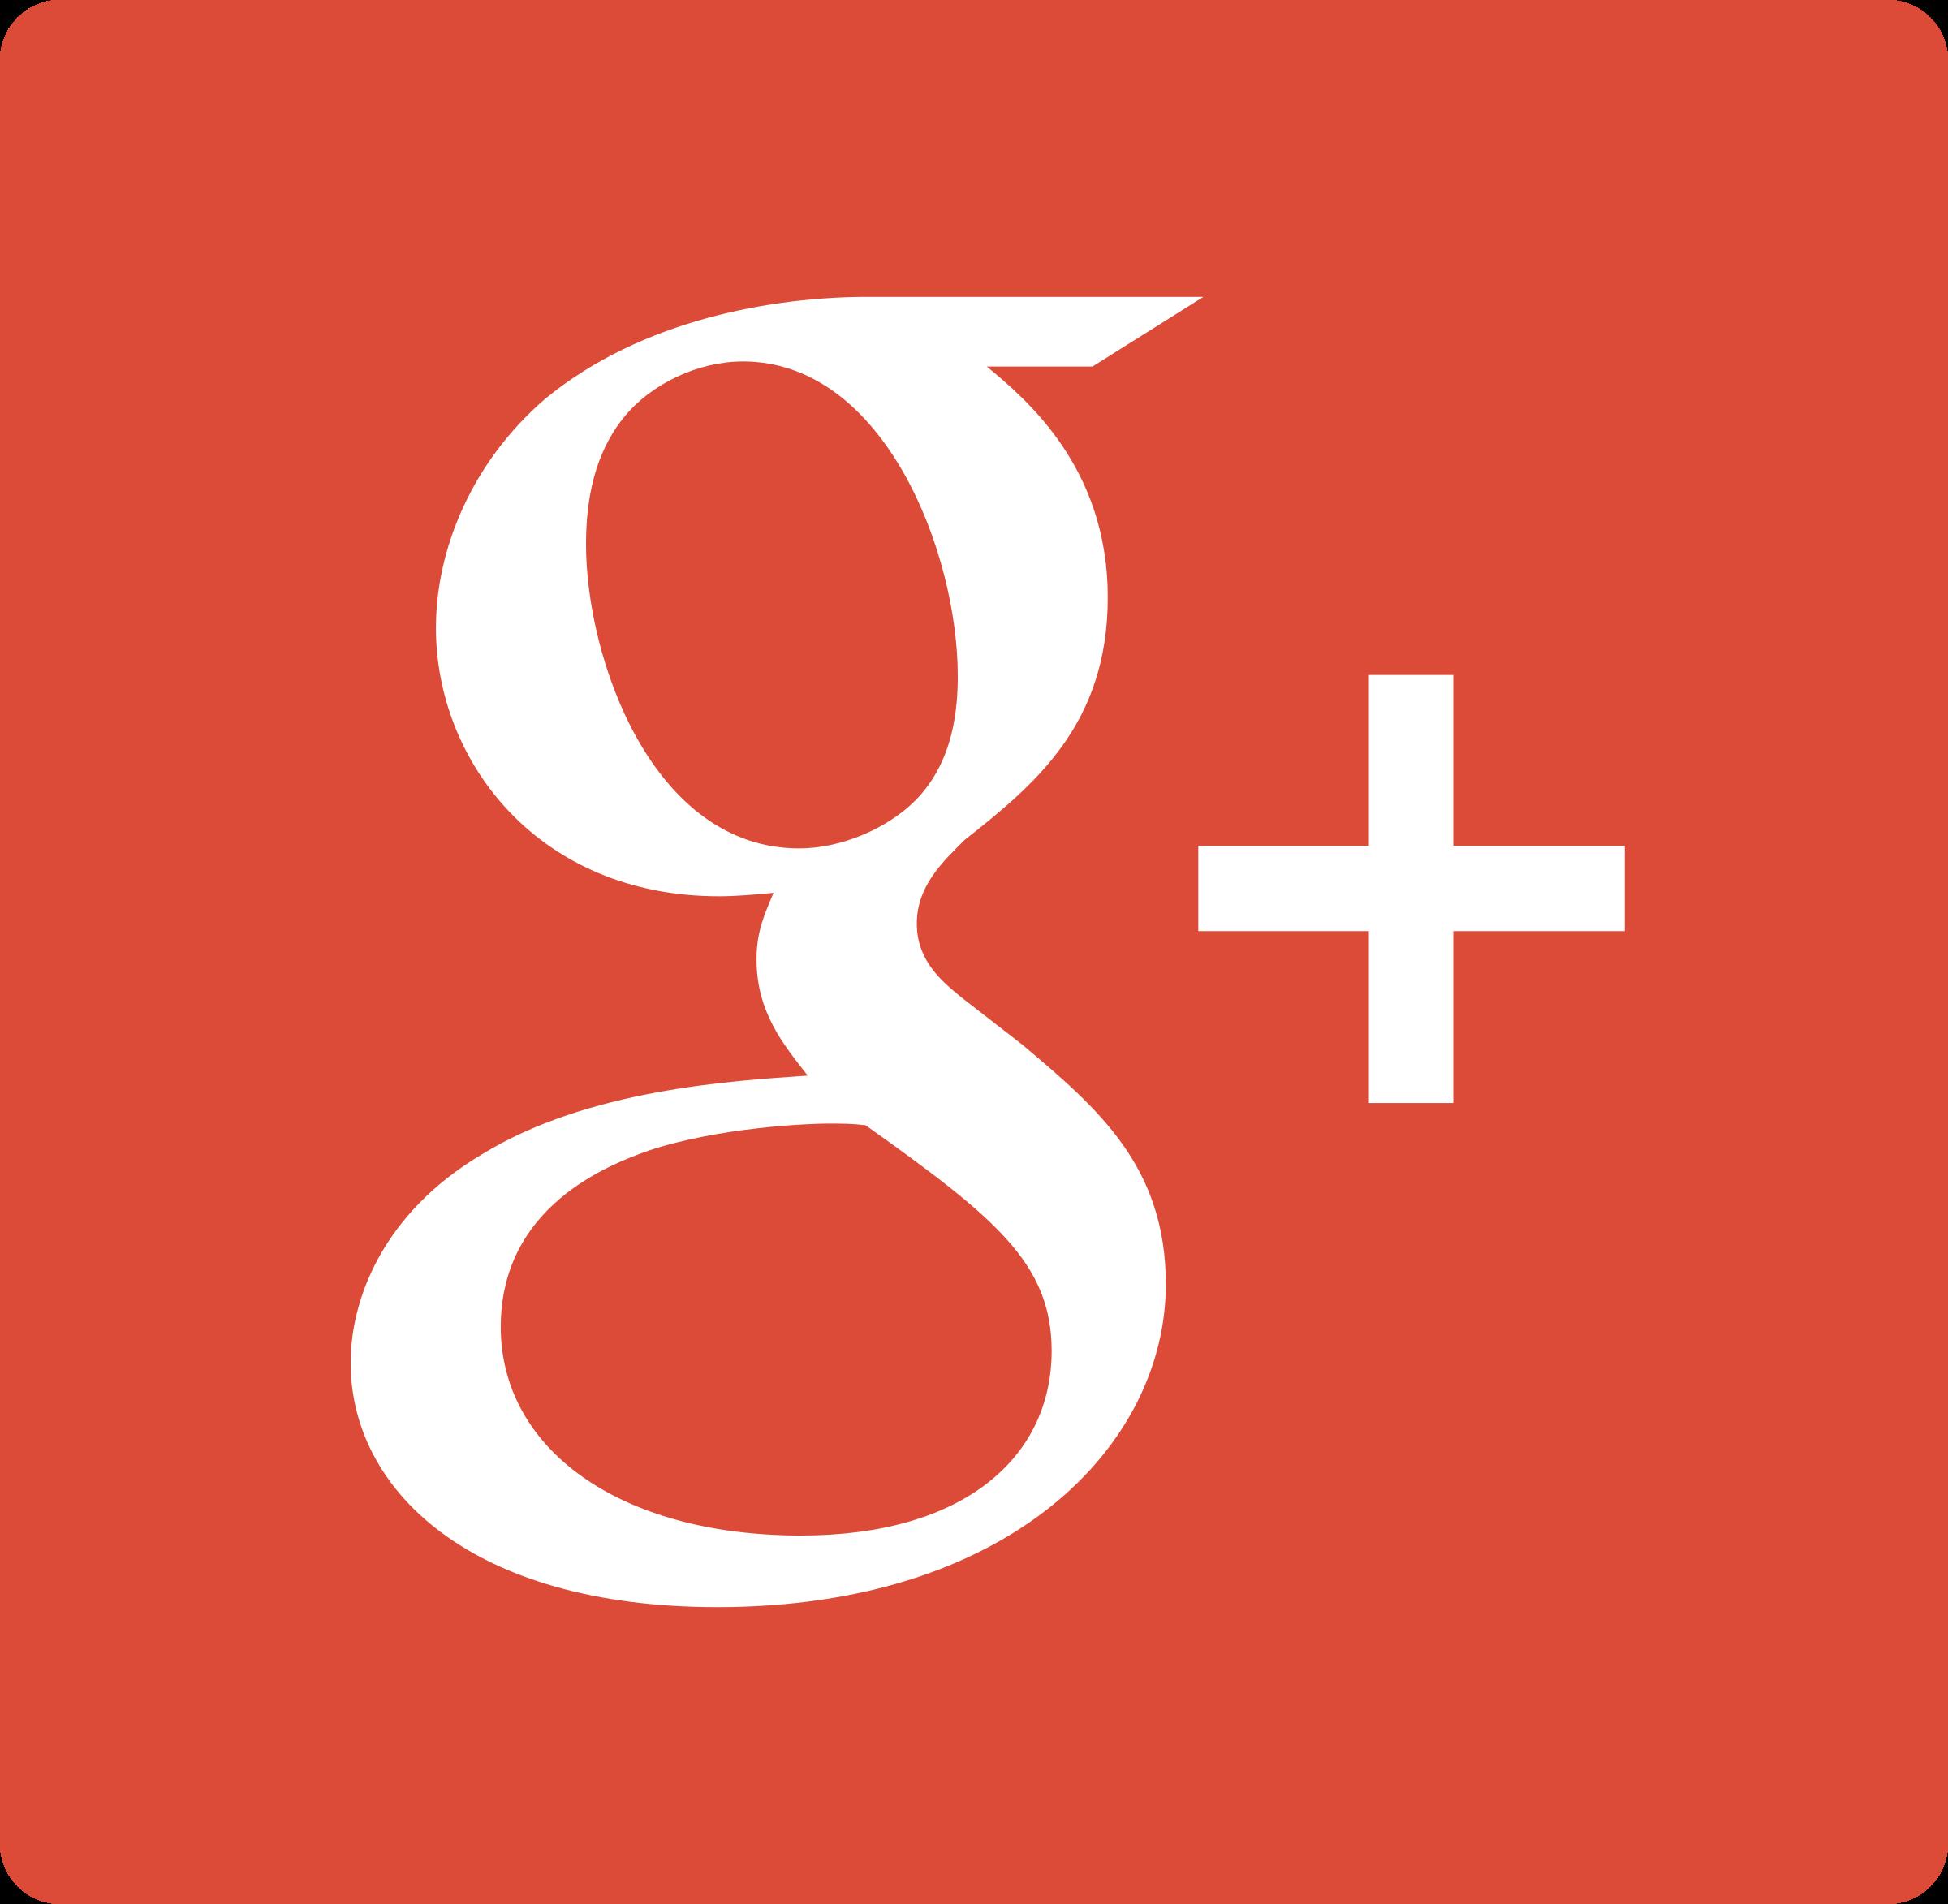 Google plus Logo PNG Transparent & SVG Vector.